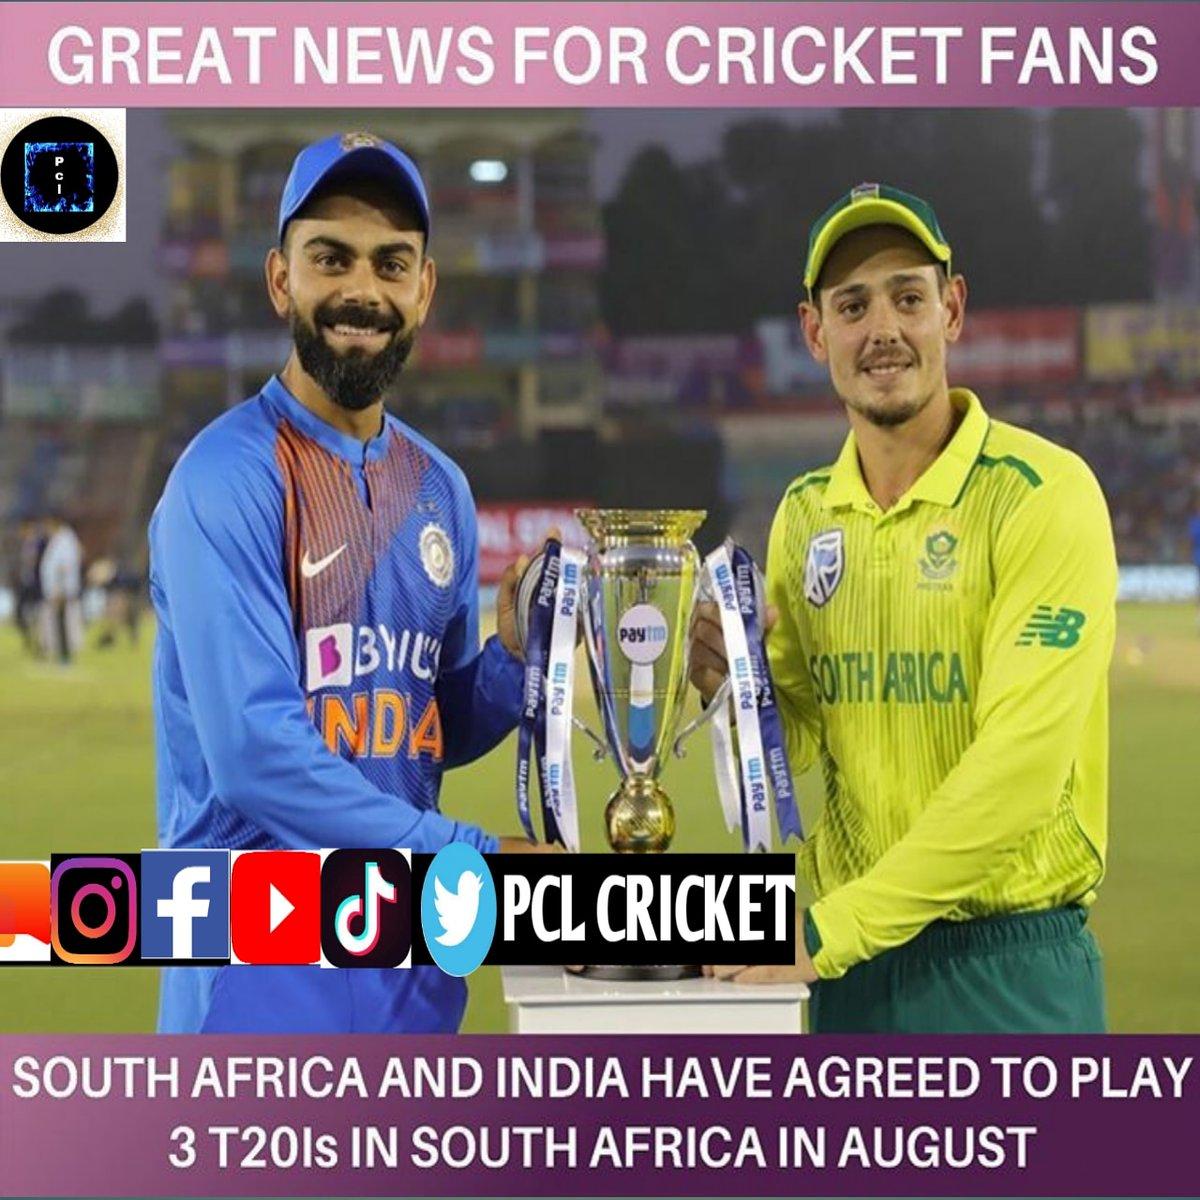 Great news 🇮🇳 #indvssa #savsind #pclcricket #viratkohli #dicock